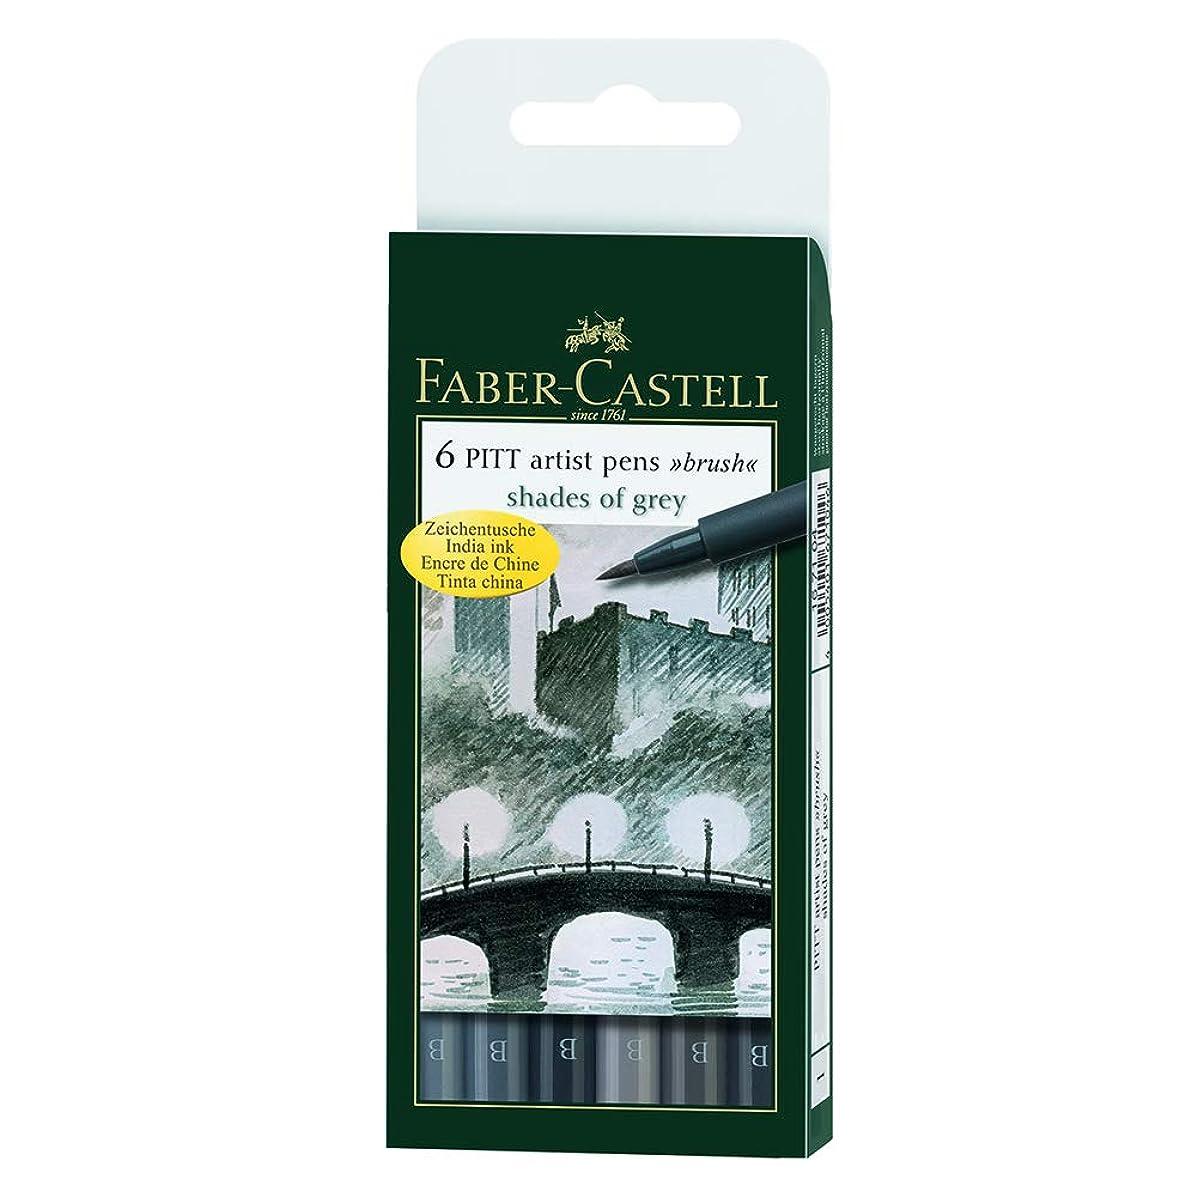 Faber-Castell - Pitt Artist Pens Set Of 6 Brush Tips-Shades Of Grey